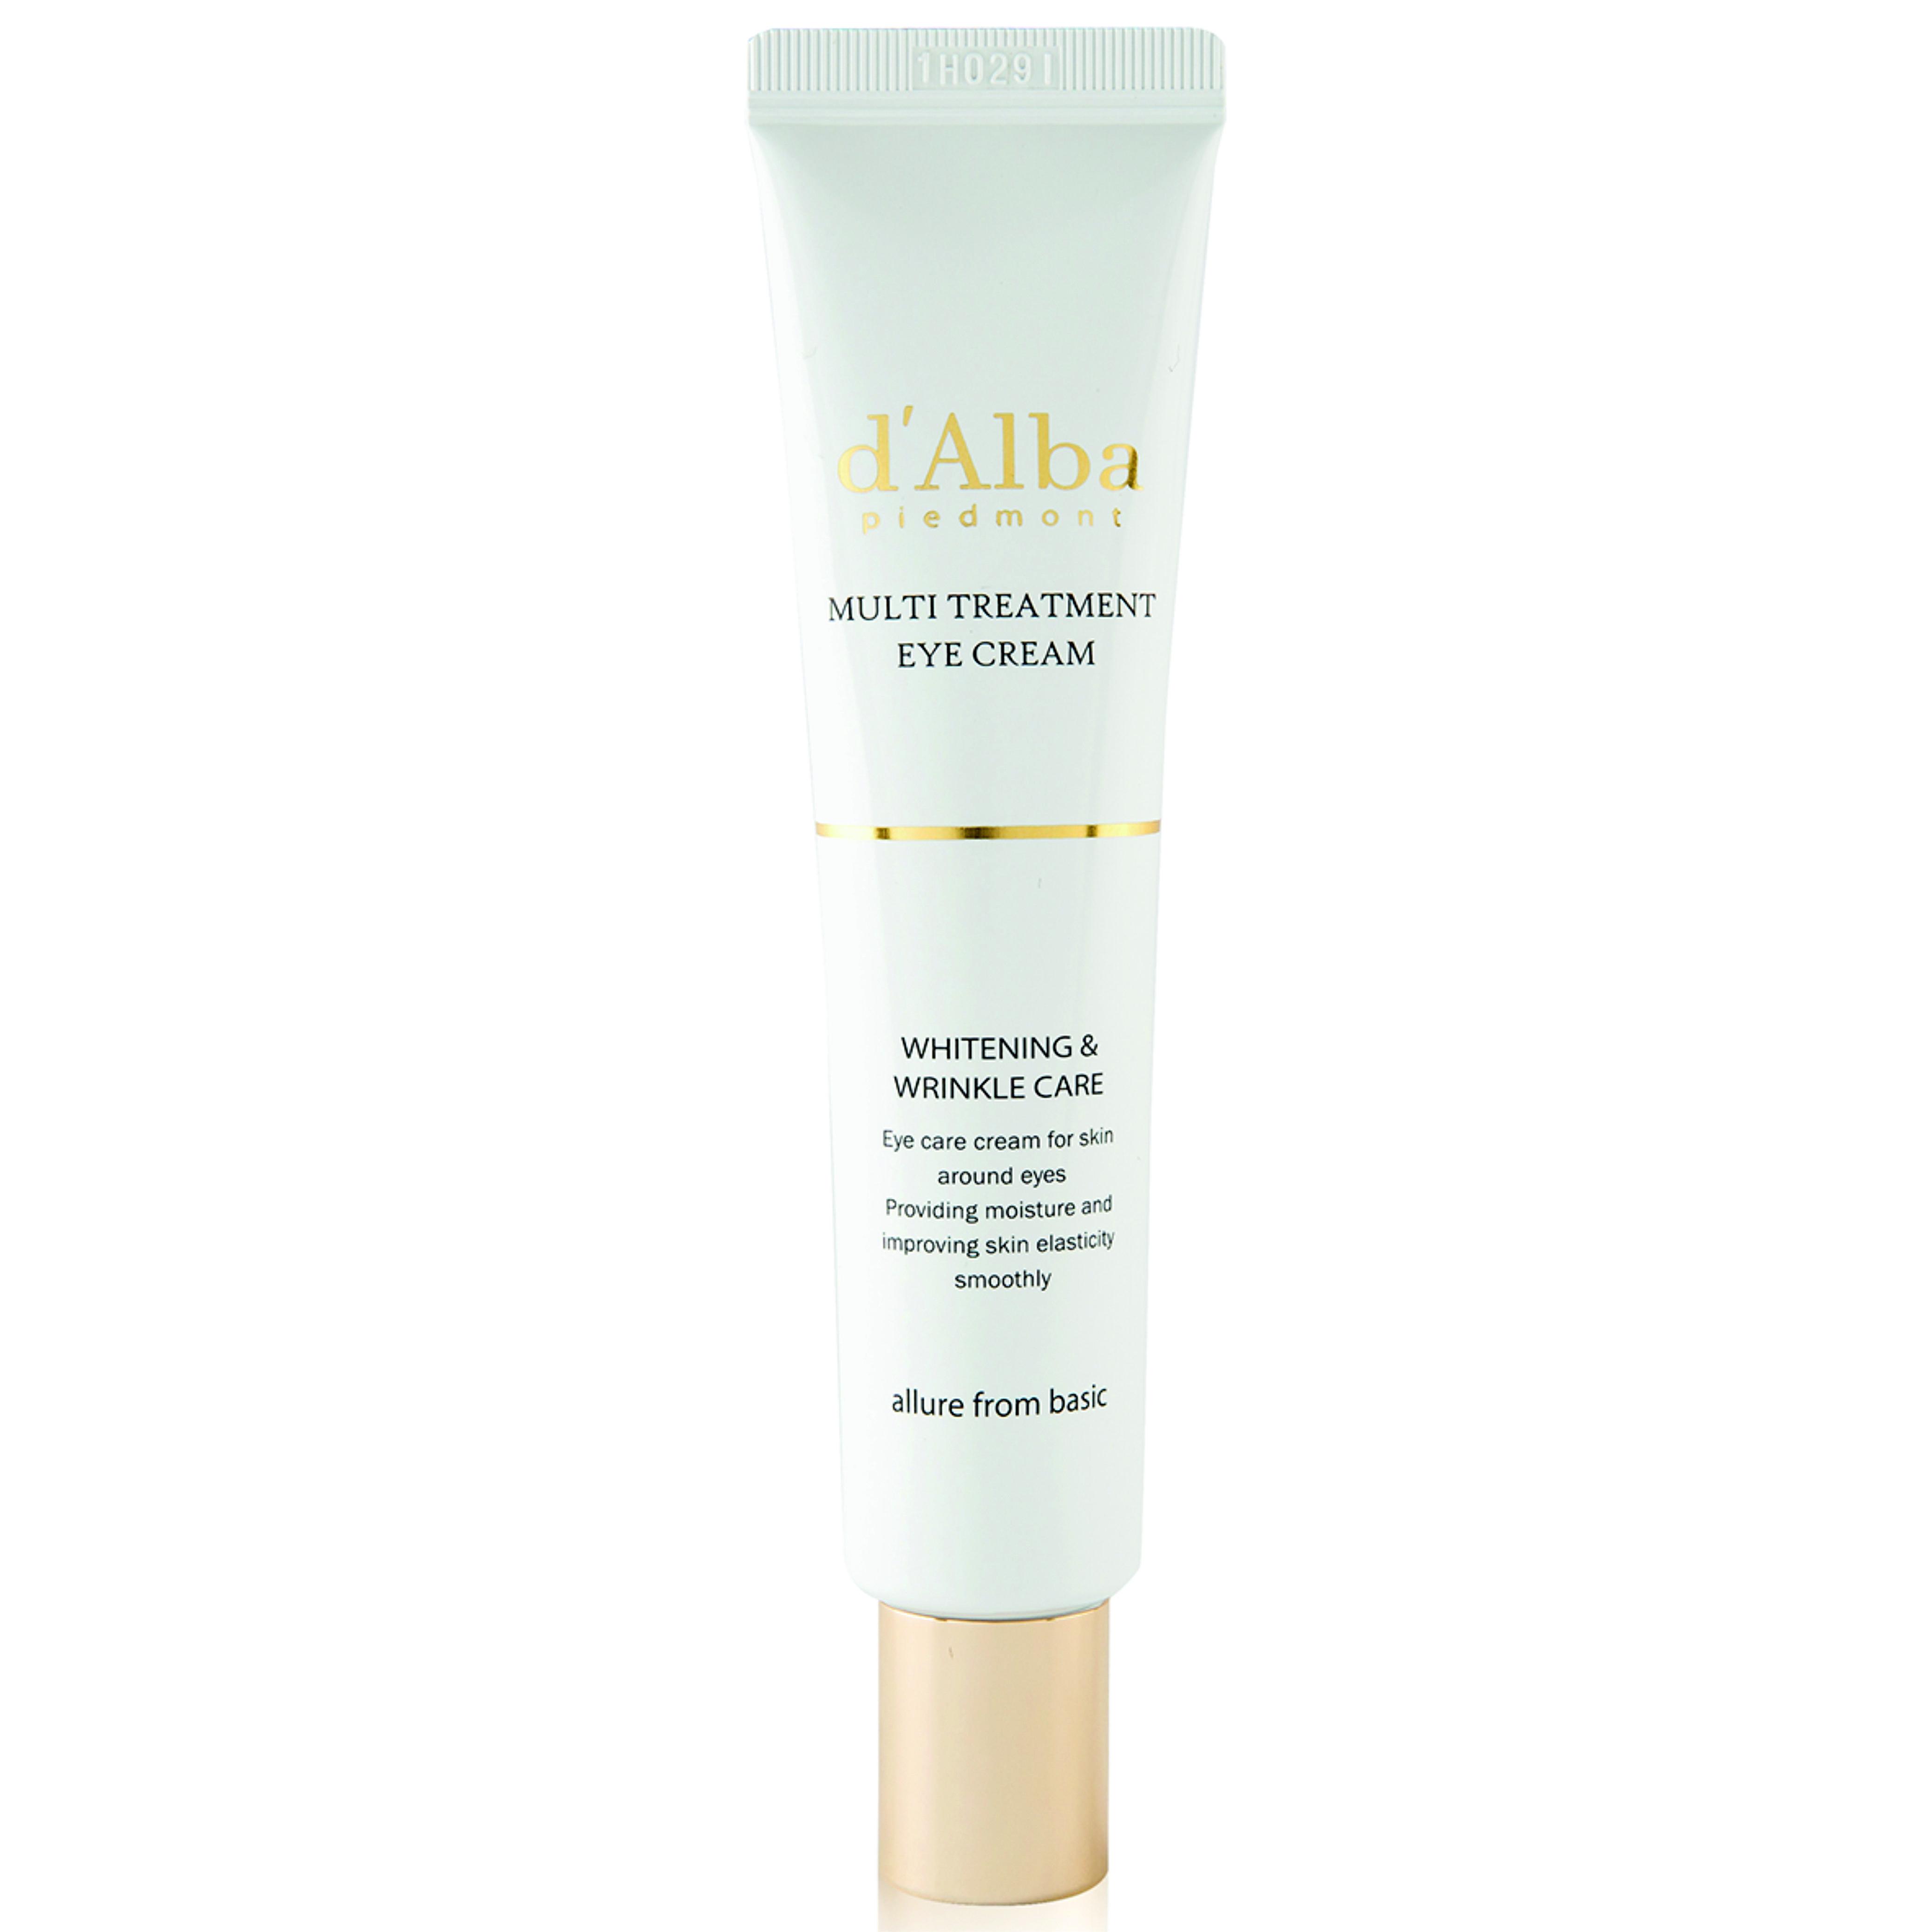 d´Alba Multi Treatment  Eye Cream